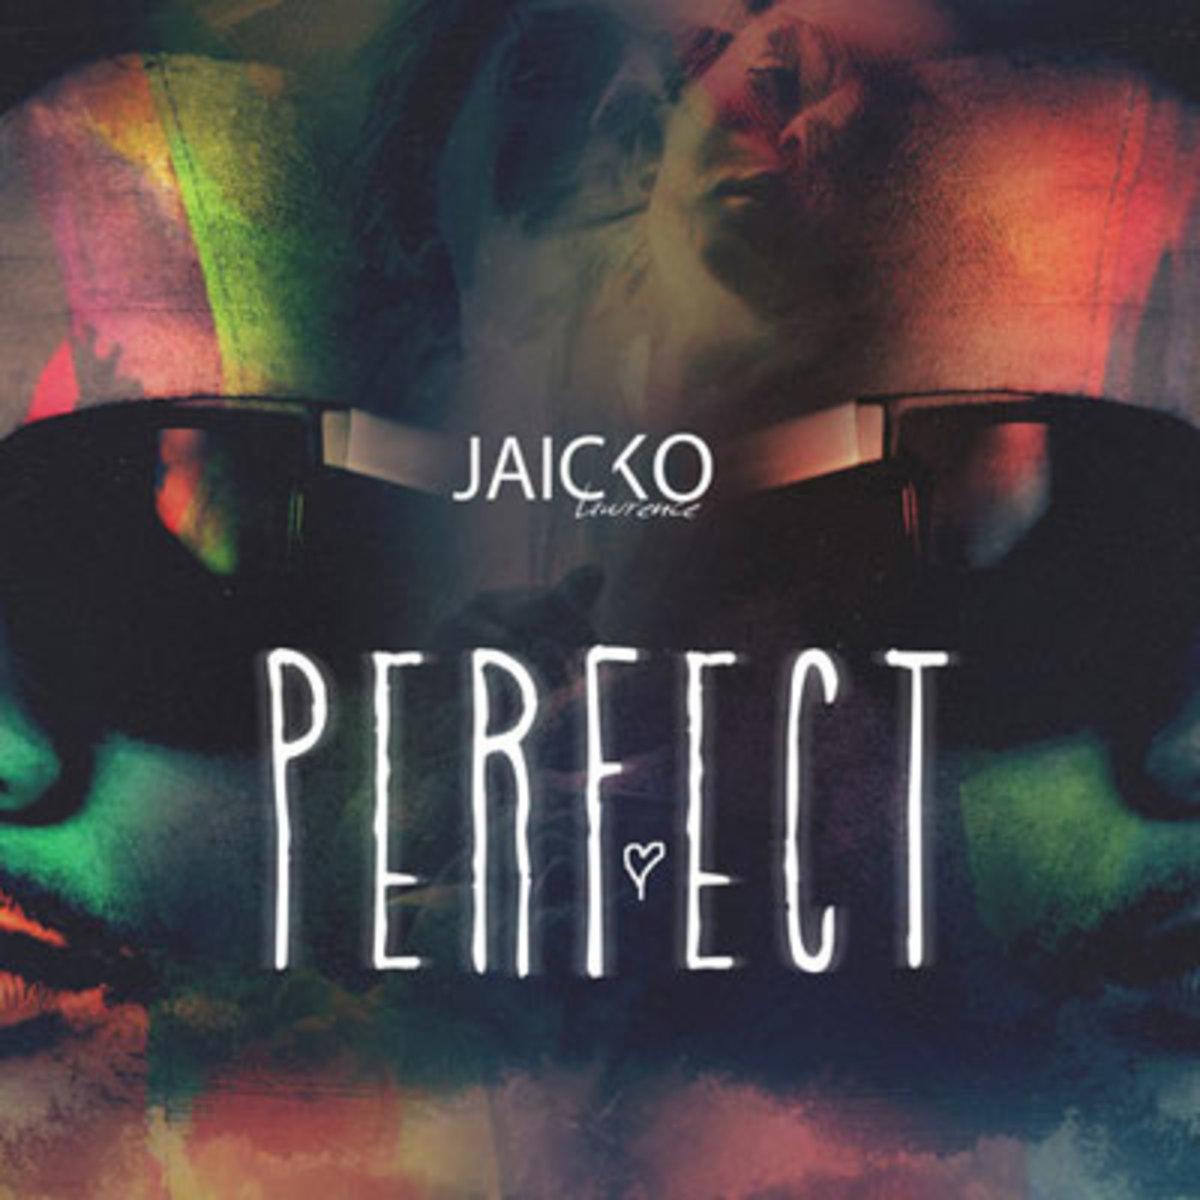 jaicko-perfectlove.jpg